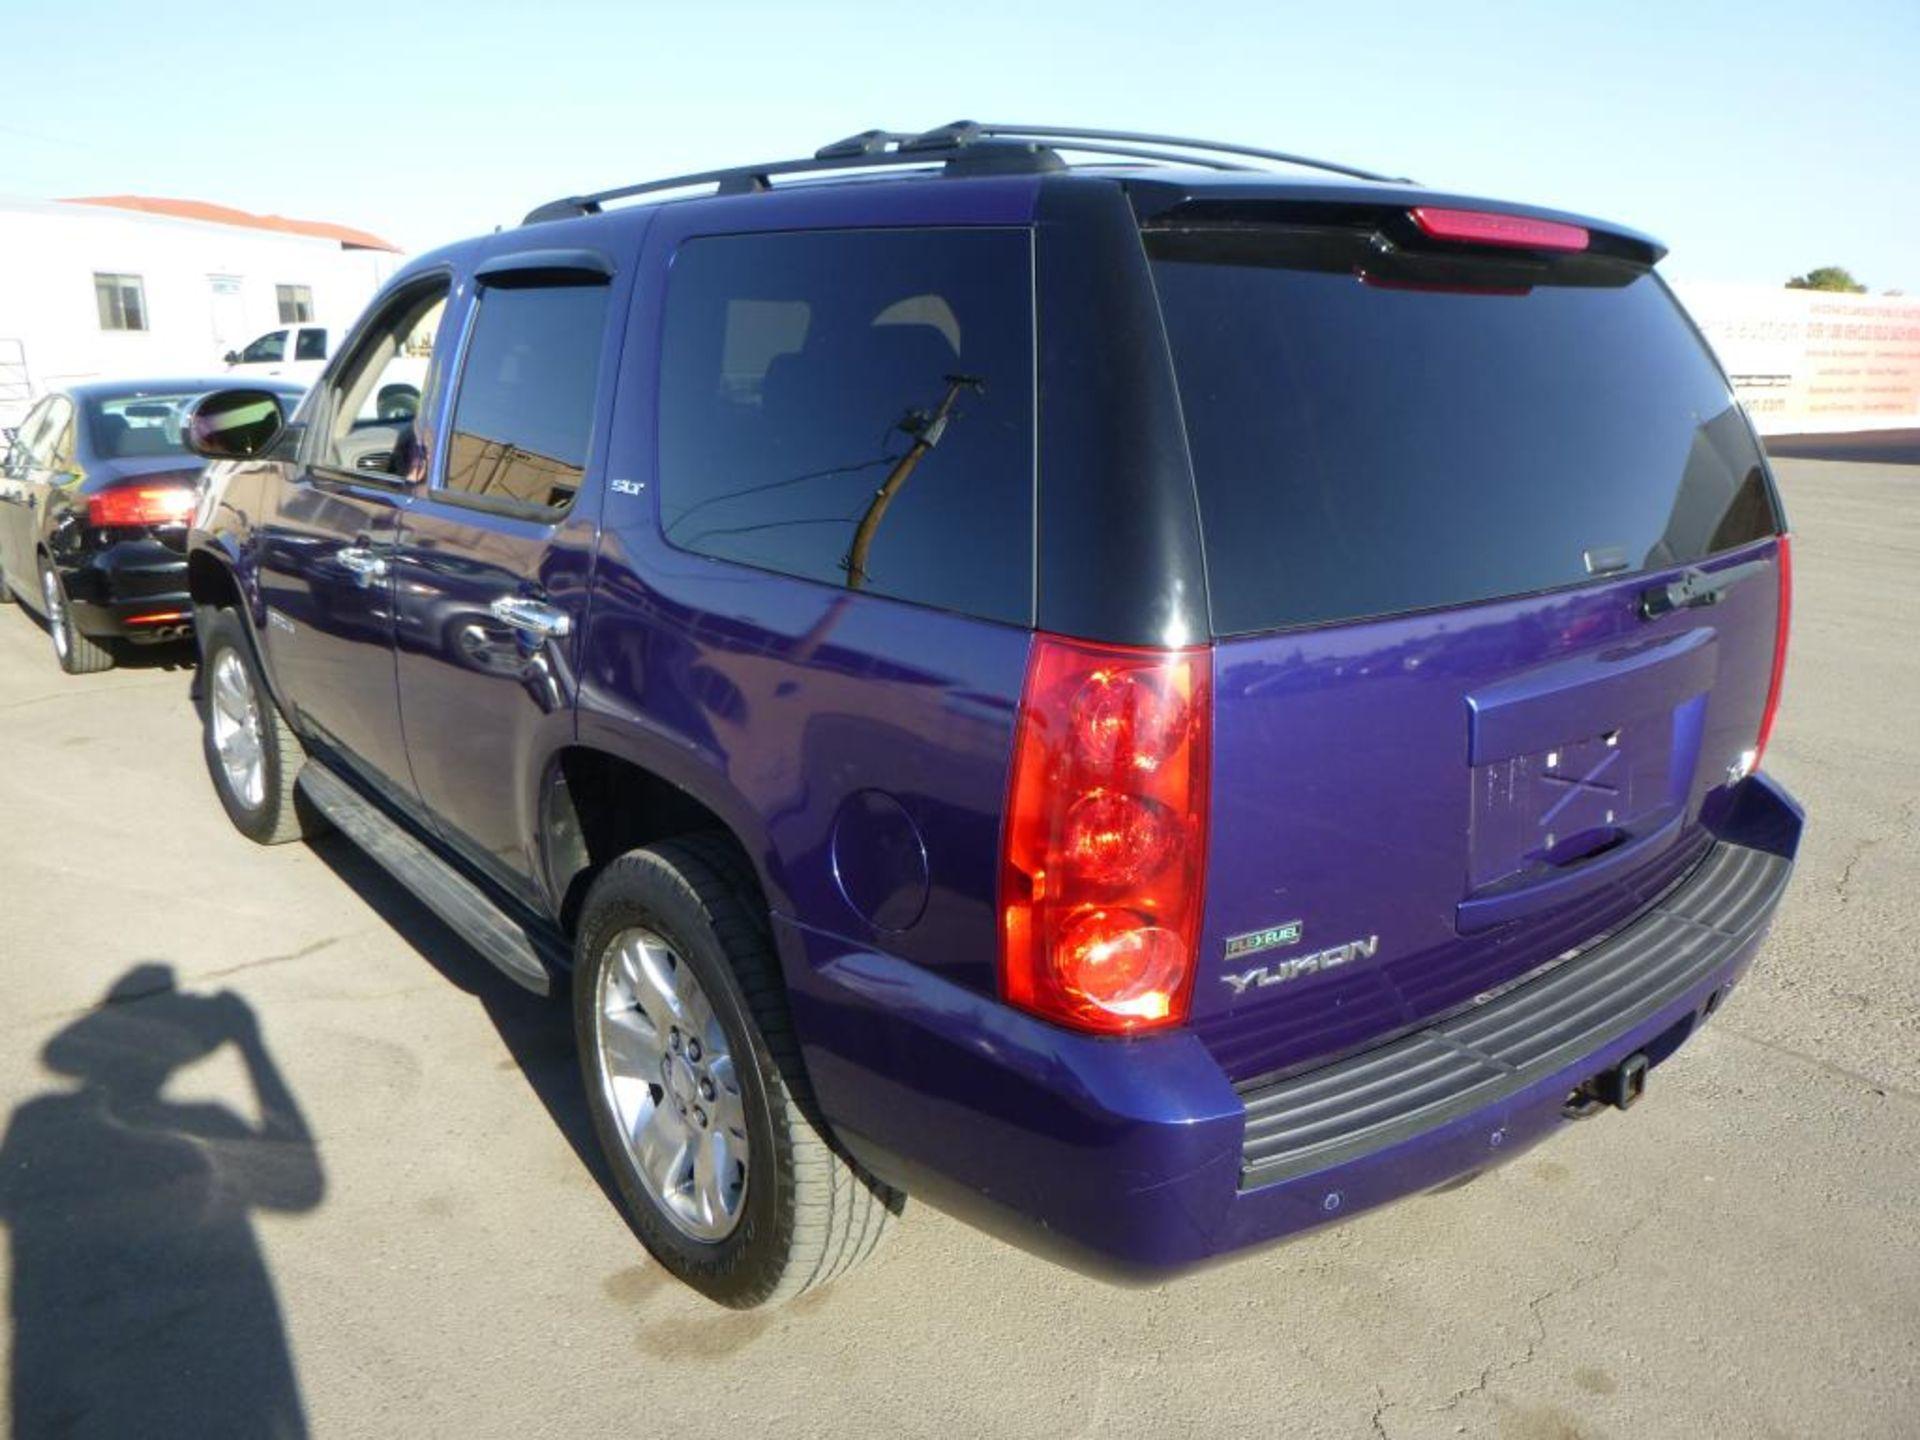 2010 GMC Yukon - Image 5 of 14